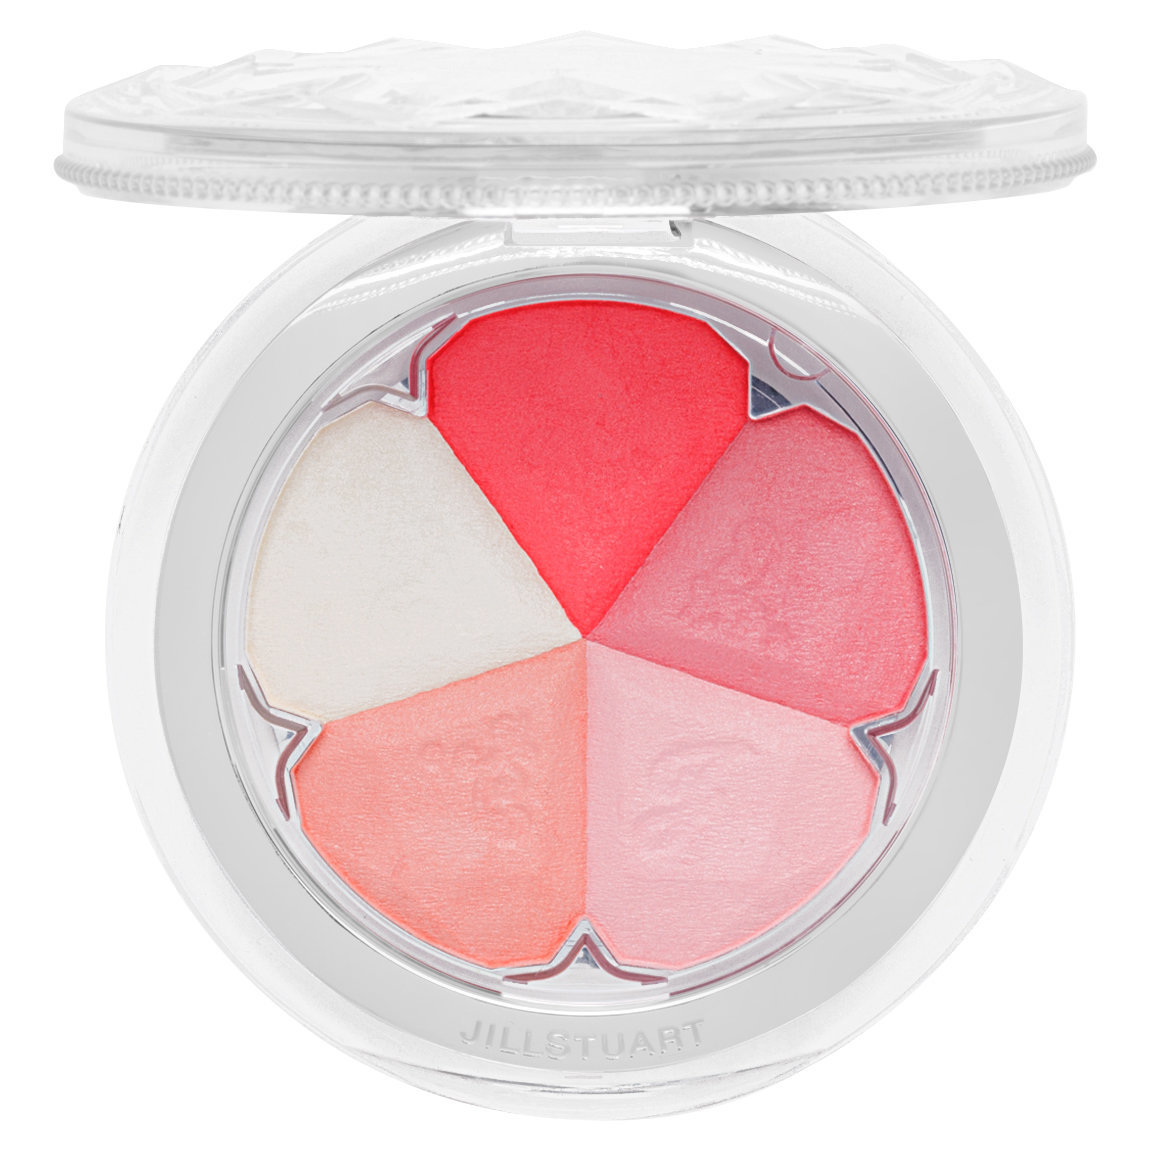 JILL STUART Beauty Bloom Mix Blush Compact 03 alternative view 1 - product swatch.